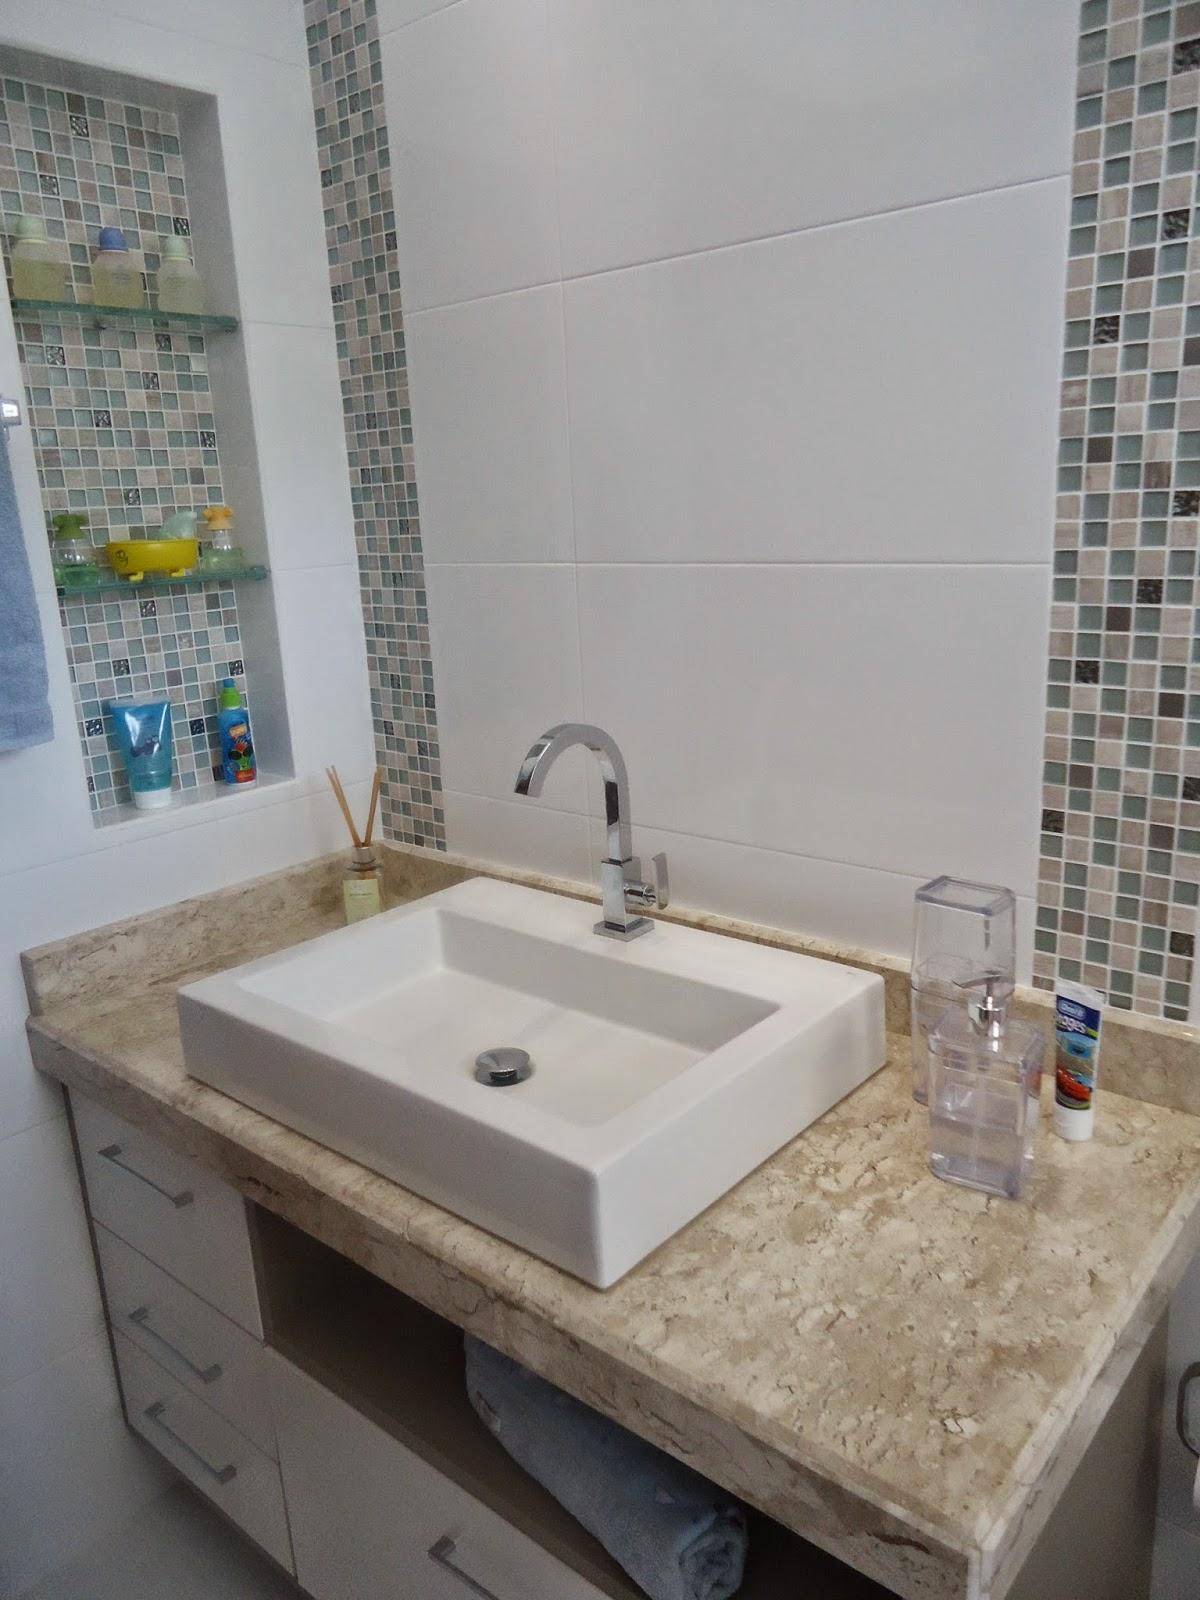 Banheiro Com Pastilhas De Vidro Bege  rinkratmagcom banheiros decorados 2017 # Banheiro Com Pastilhas De Vidro Laranja